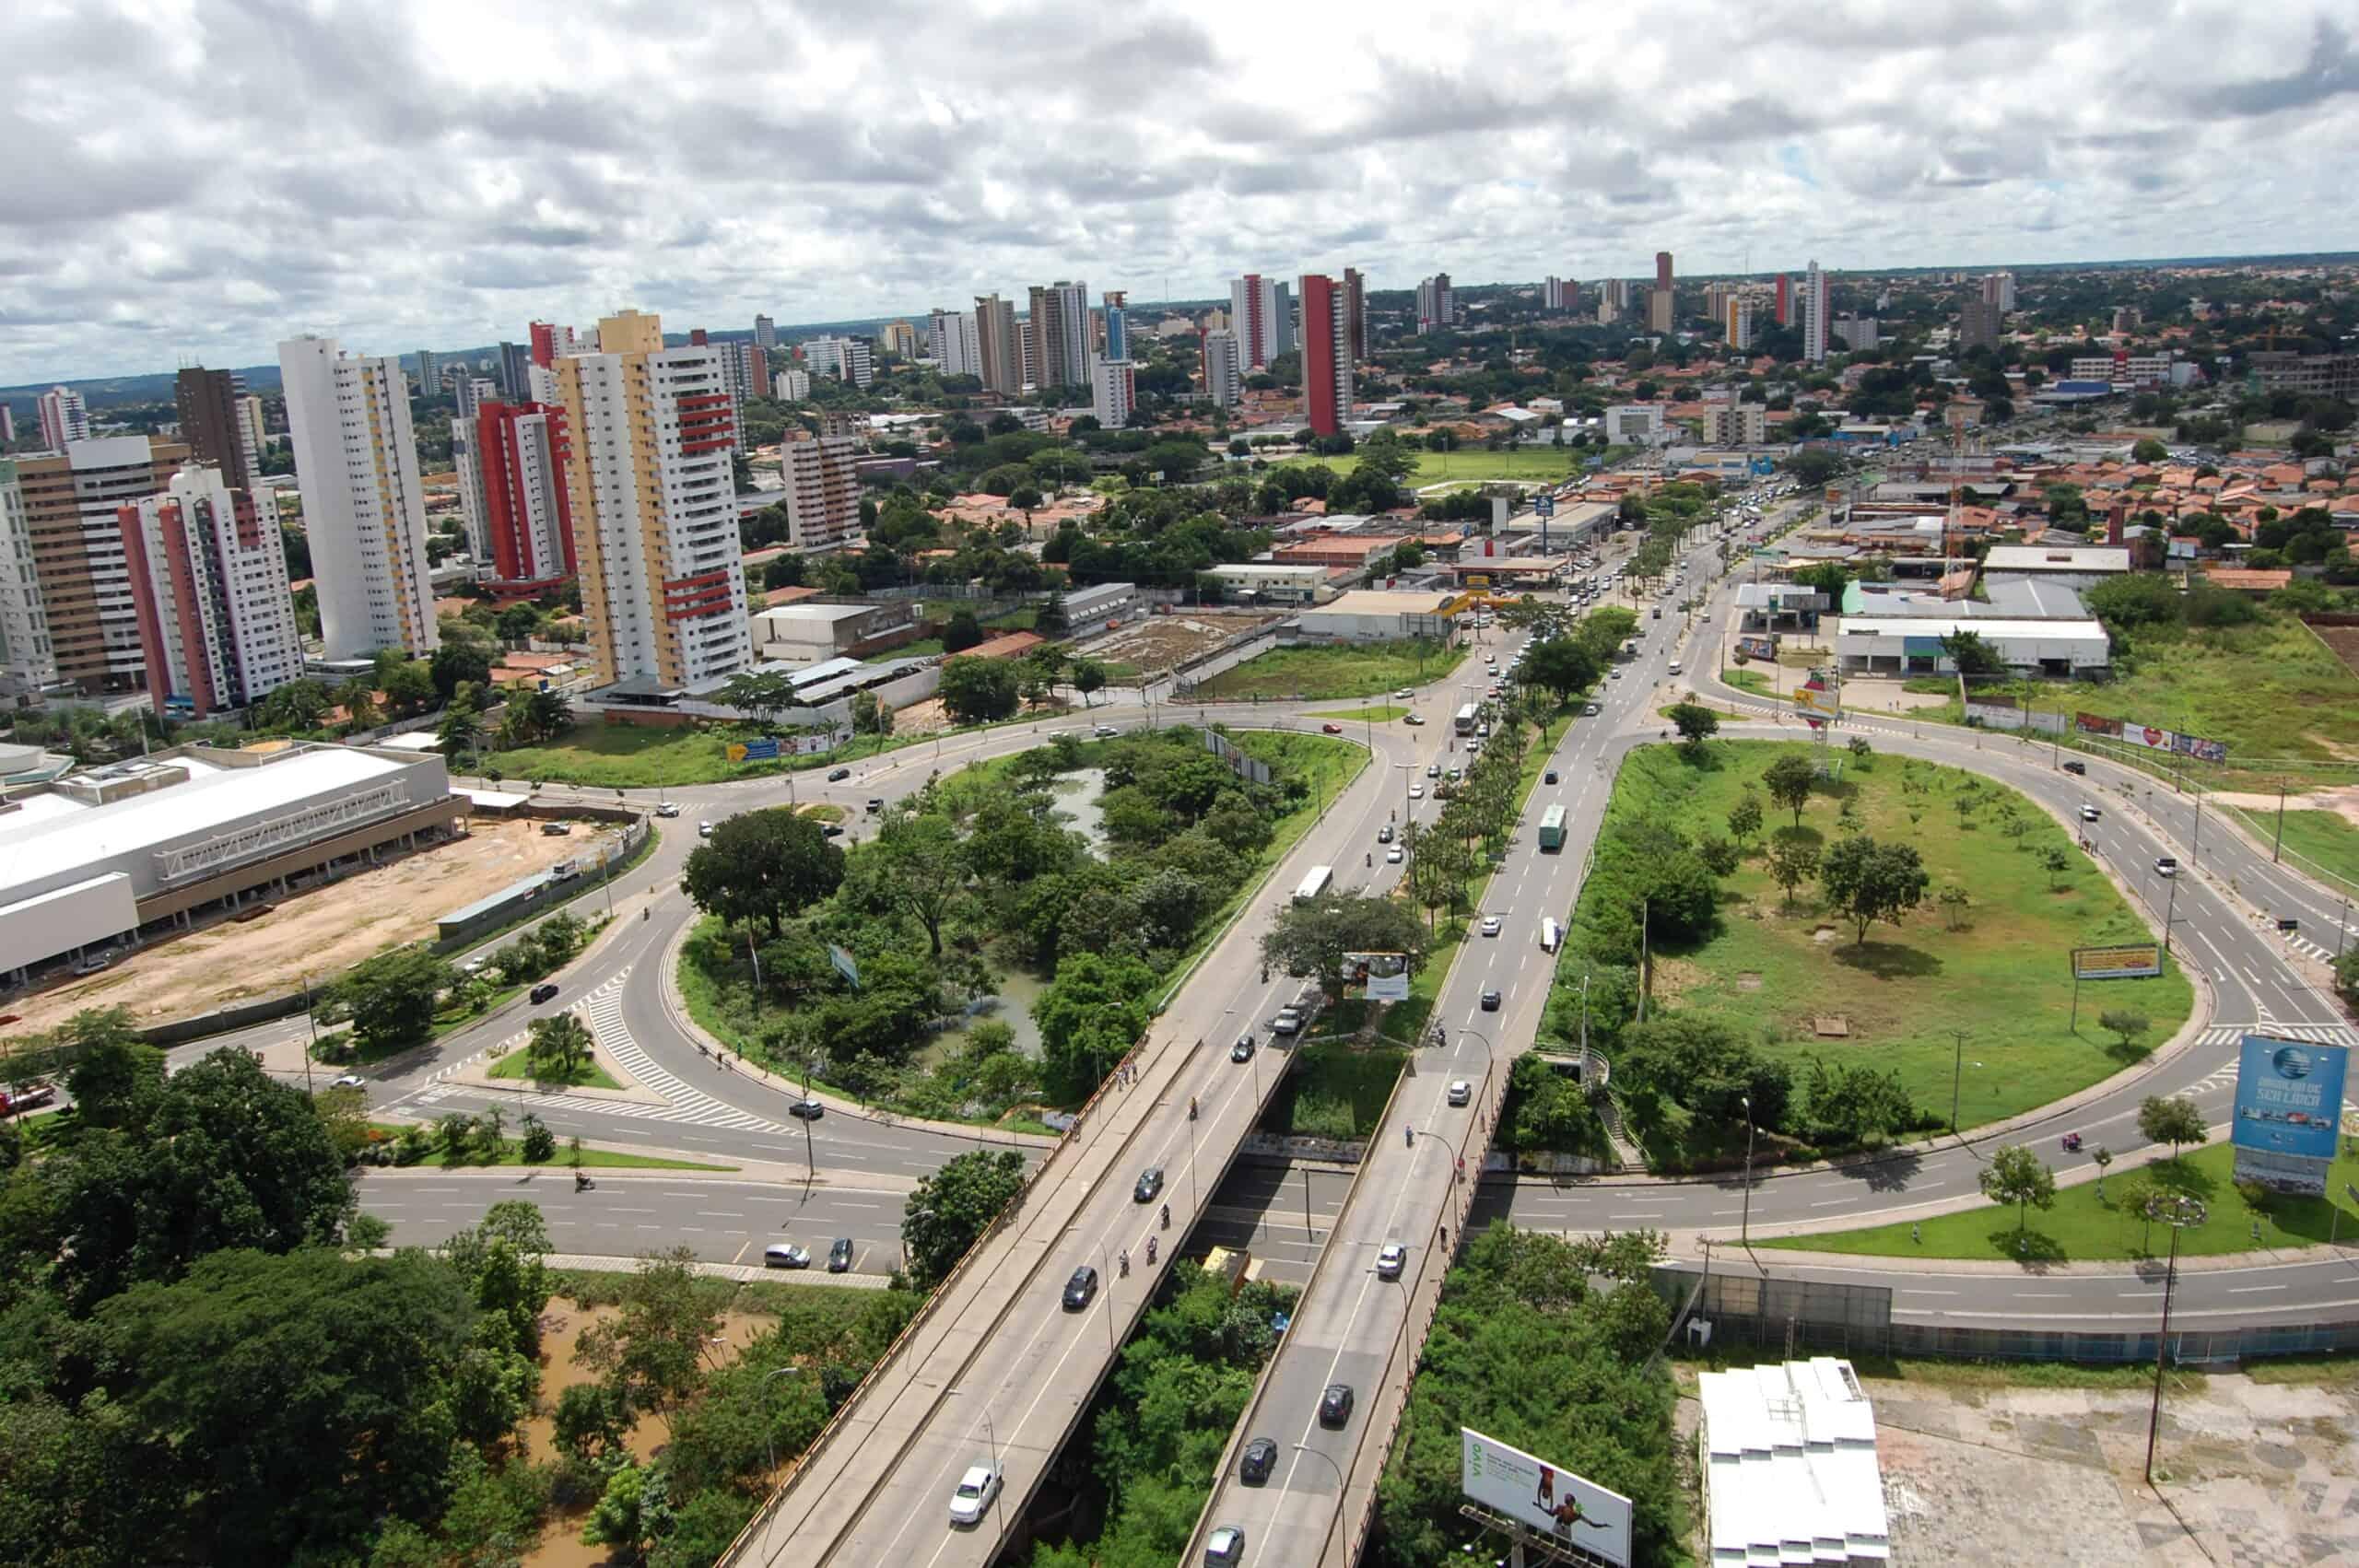 IPTU Teresina 2020: prefeitura reajusta valor para este ano